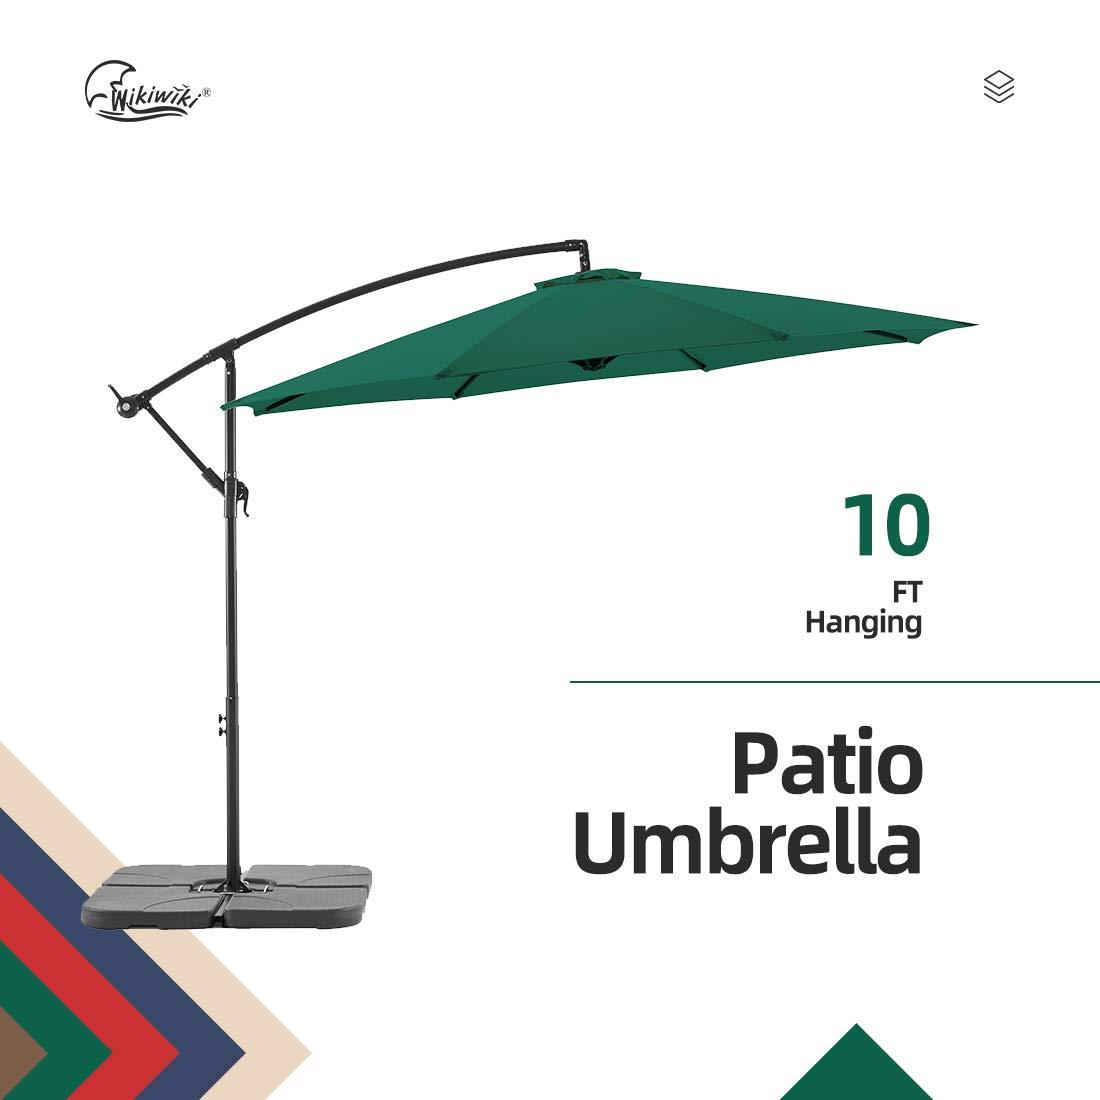 Beige Wikiwiki Offset Umbrella 10ft Cantilever Patio Umbrella Hanging Market Umbrella Outdoor Umbrellas with Crank /& Cross Base